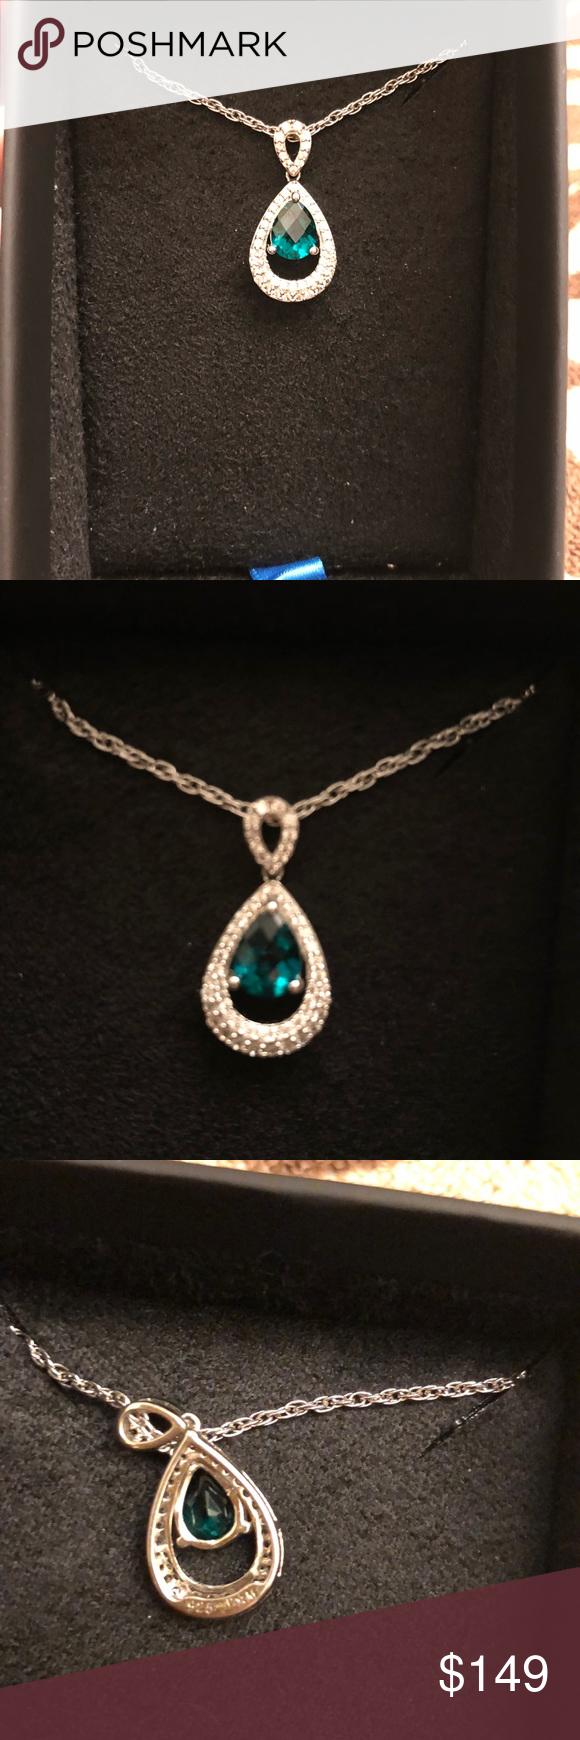 Man made emerald pendant set in s silver nwt my posh picks